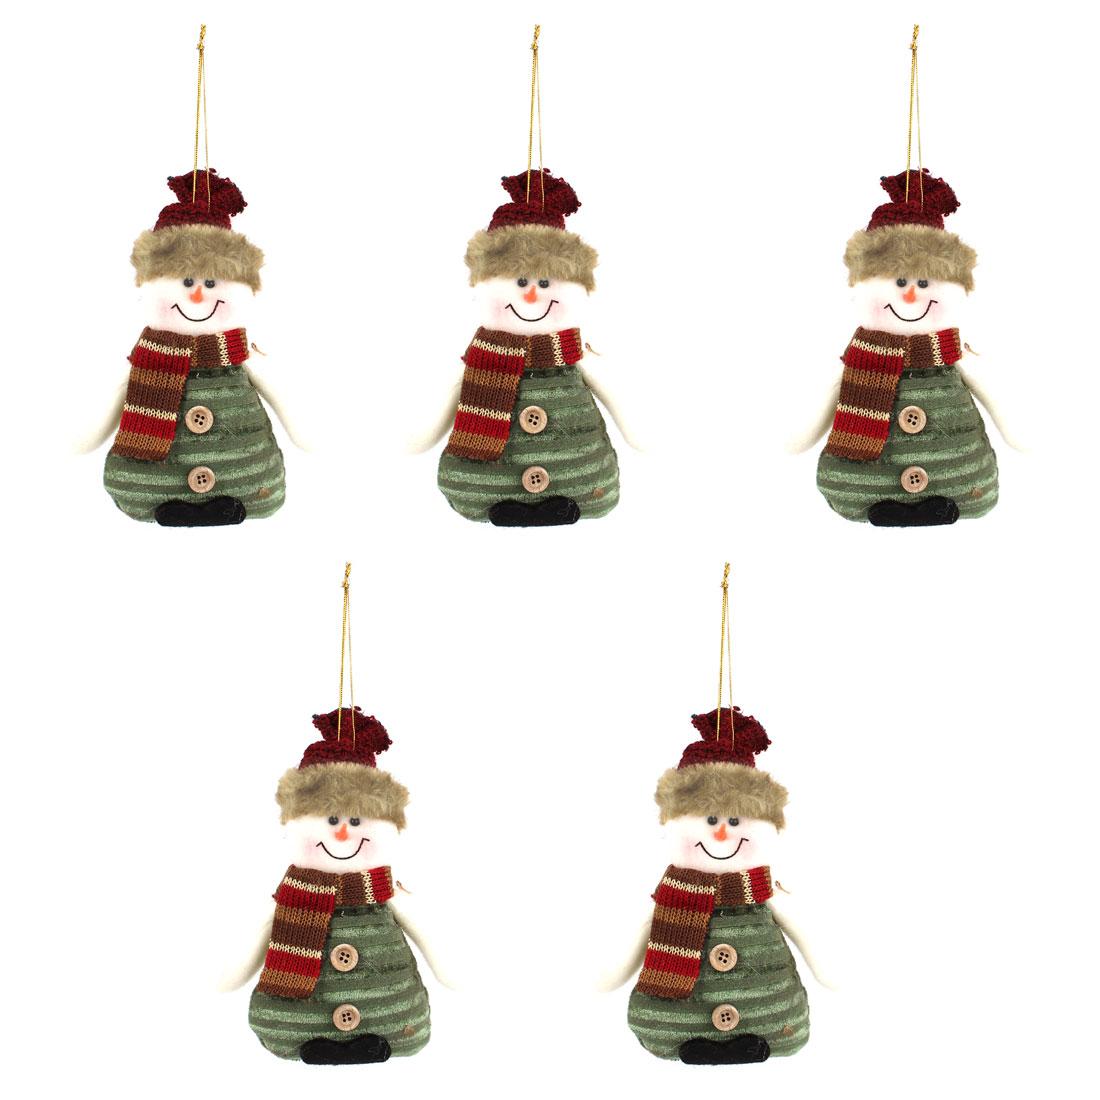 Scarf Cap Accent Xmas Snowman Pendant Olive Green 5pcs for Door Christmas Tree Hanging Decor